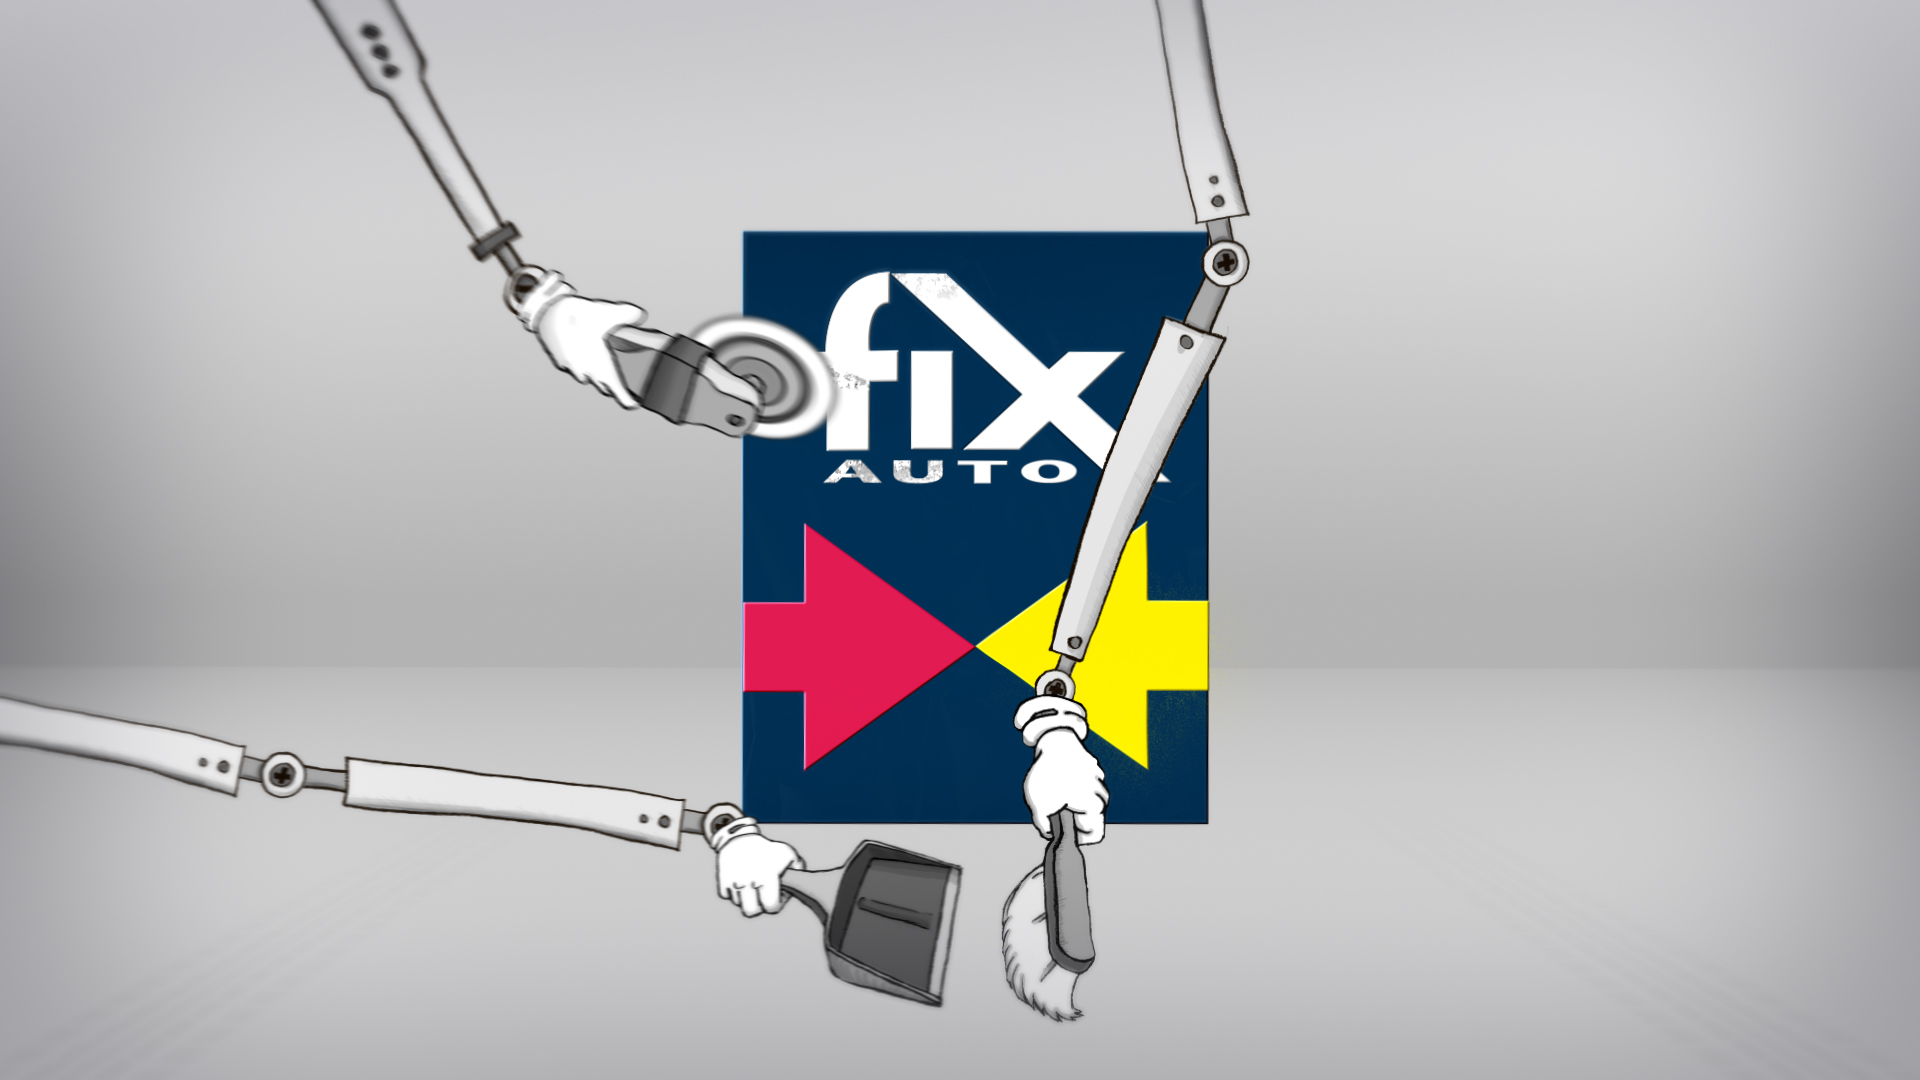 FIX_AUTO_tune_up_en_web_00329.jpg